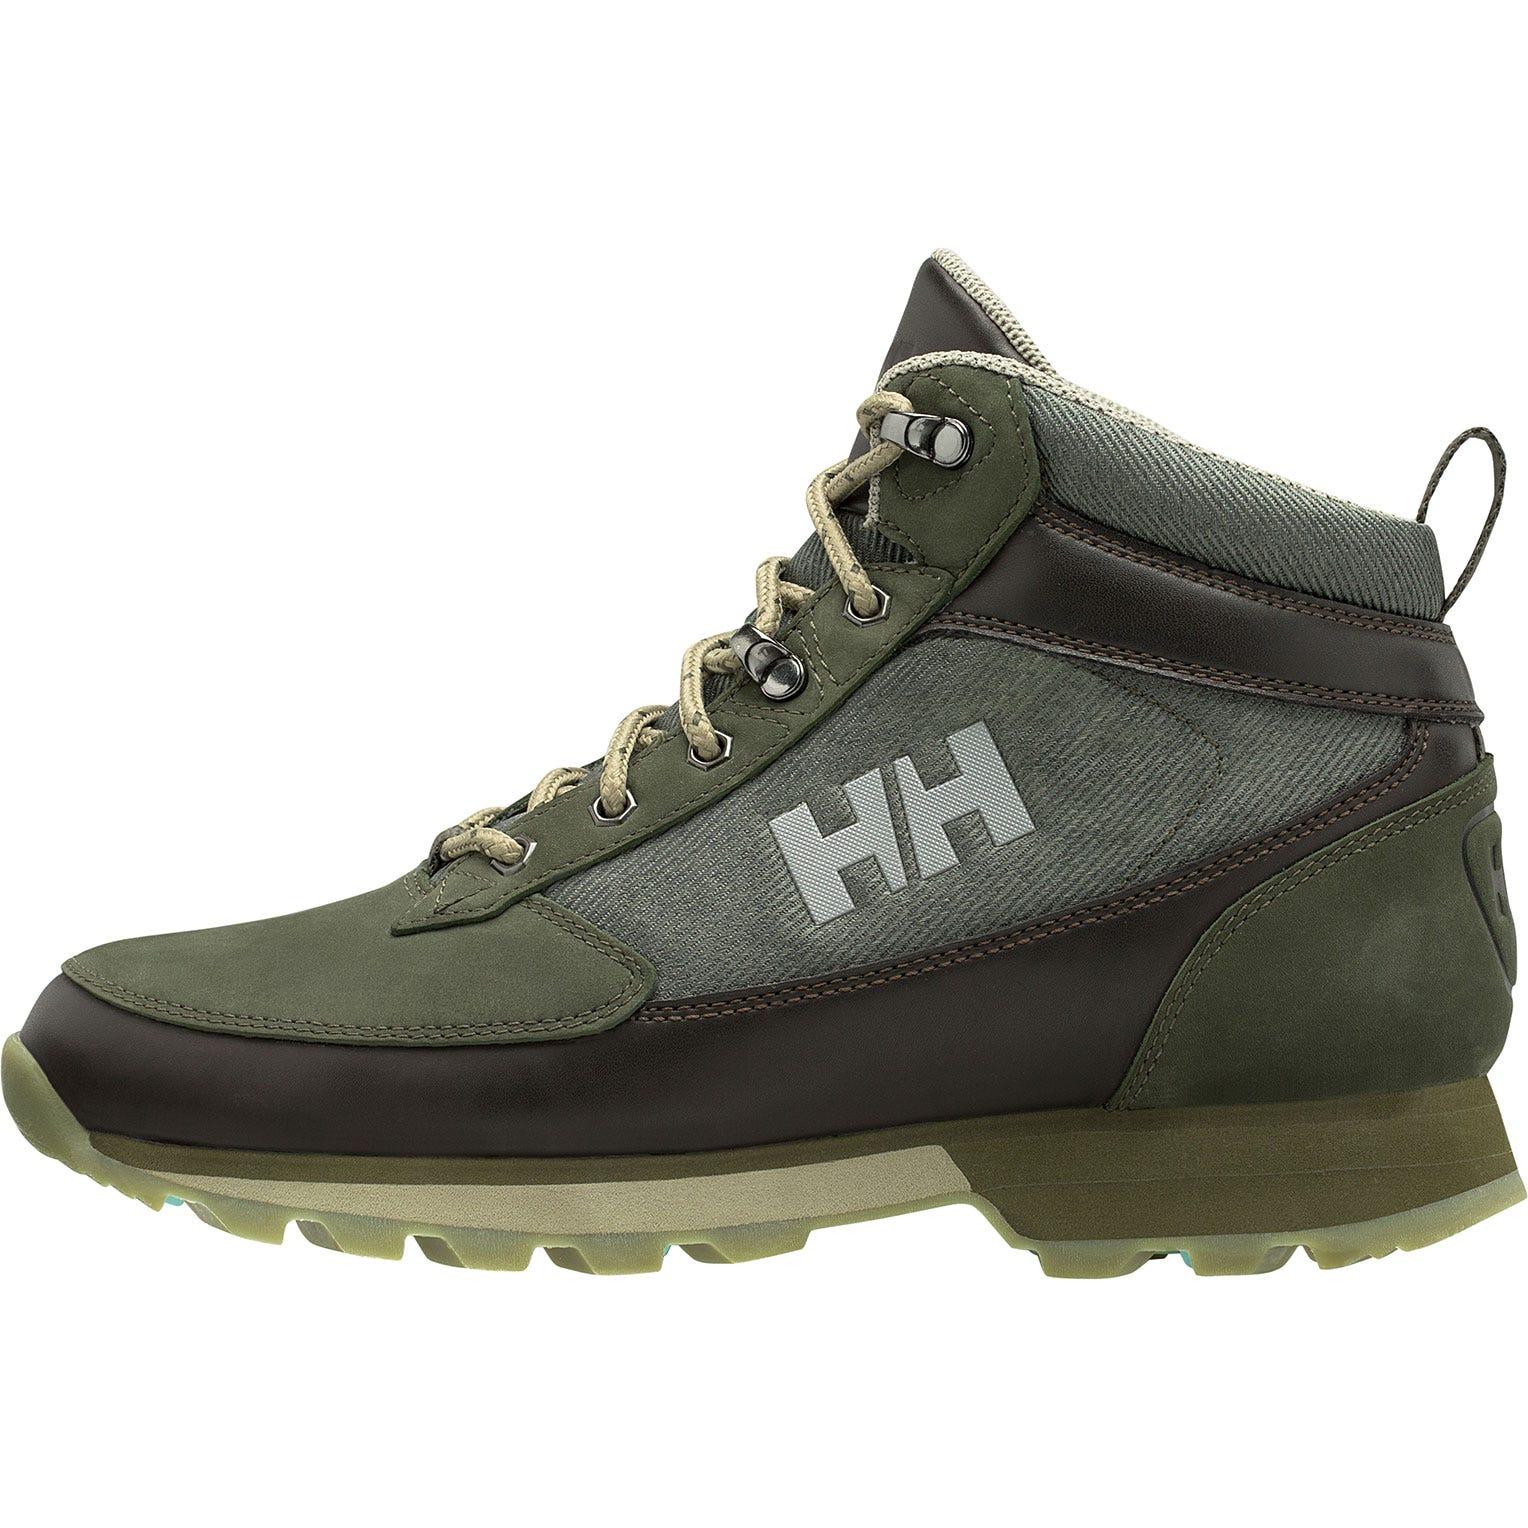 Helly Hansen W Chilcotin Womens Winter Boot Green 39.3/8